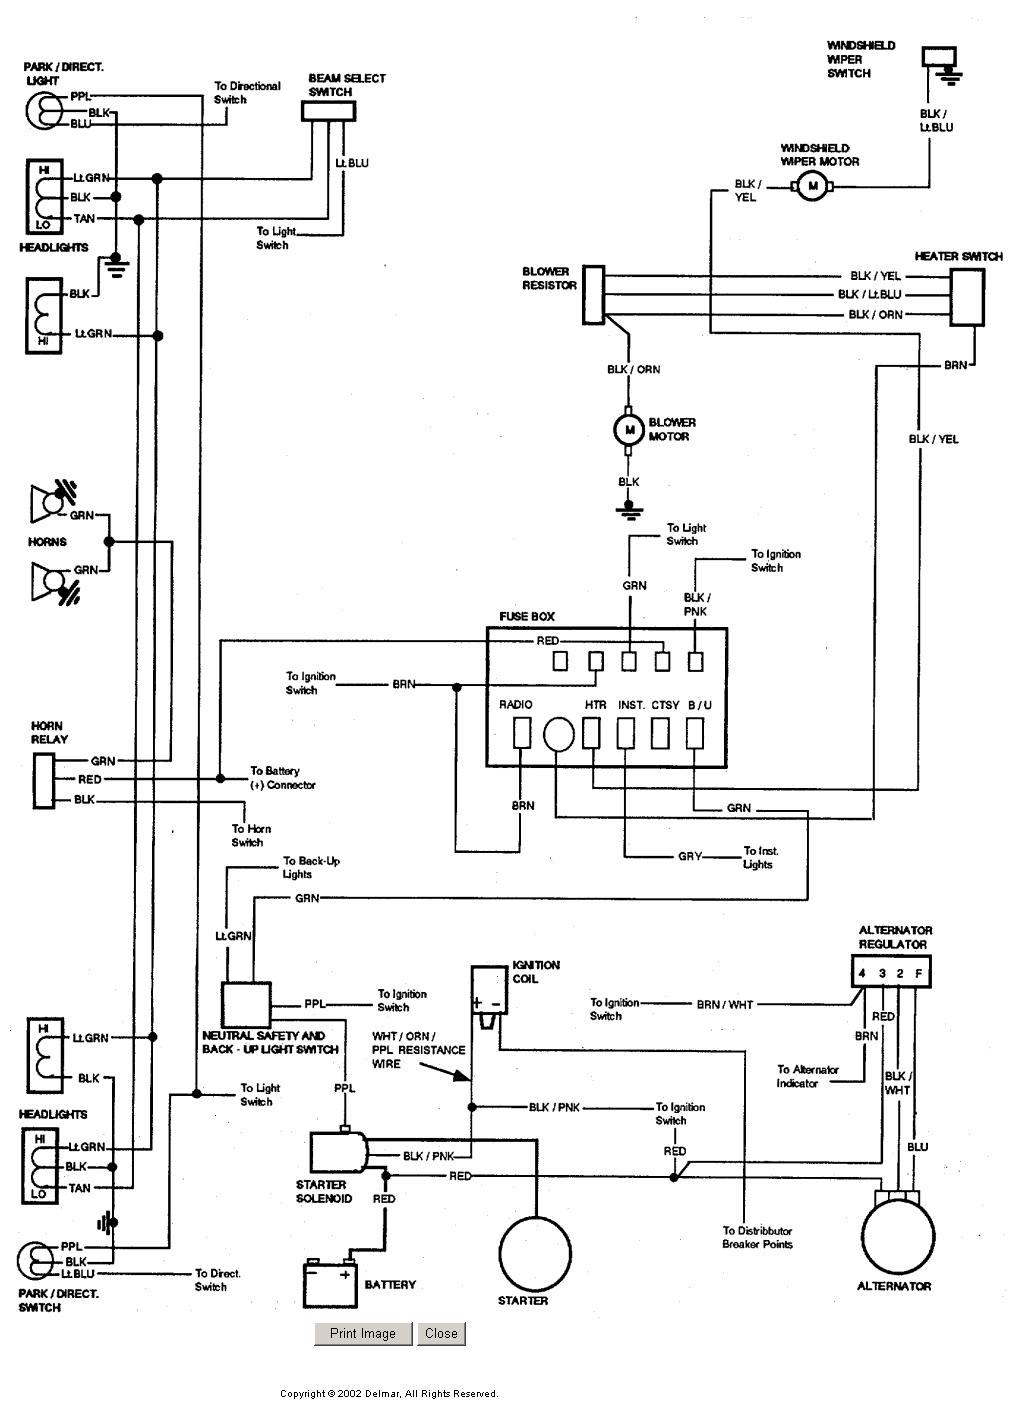 [SCHEMATICS_4ER]  VF_9930] 71 Chevy Chevelle Horn Wiring Diagram Schematic Wiring | 1966 El Camino Wiring Diagram |  | Icism Epete Inama Mohammedshrine Librar Wiring 101